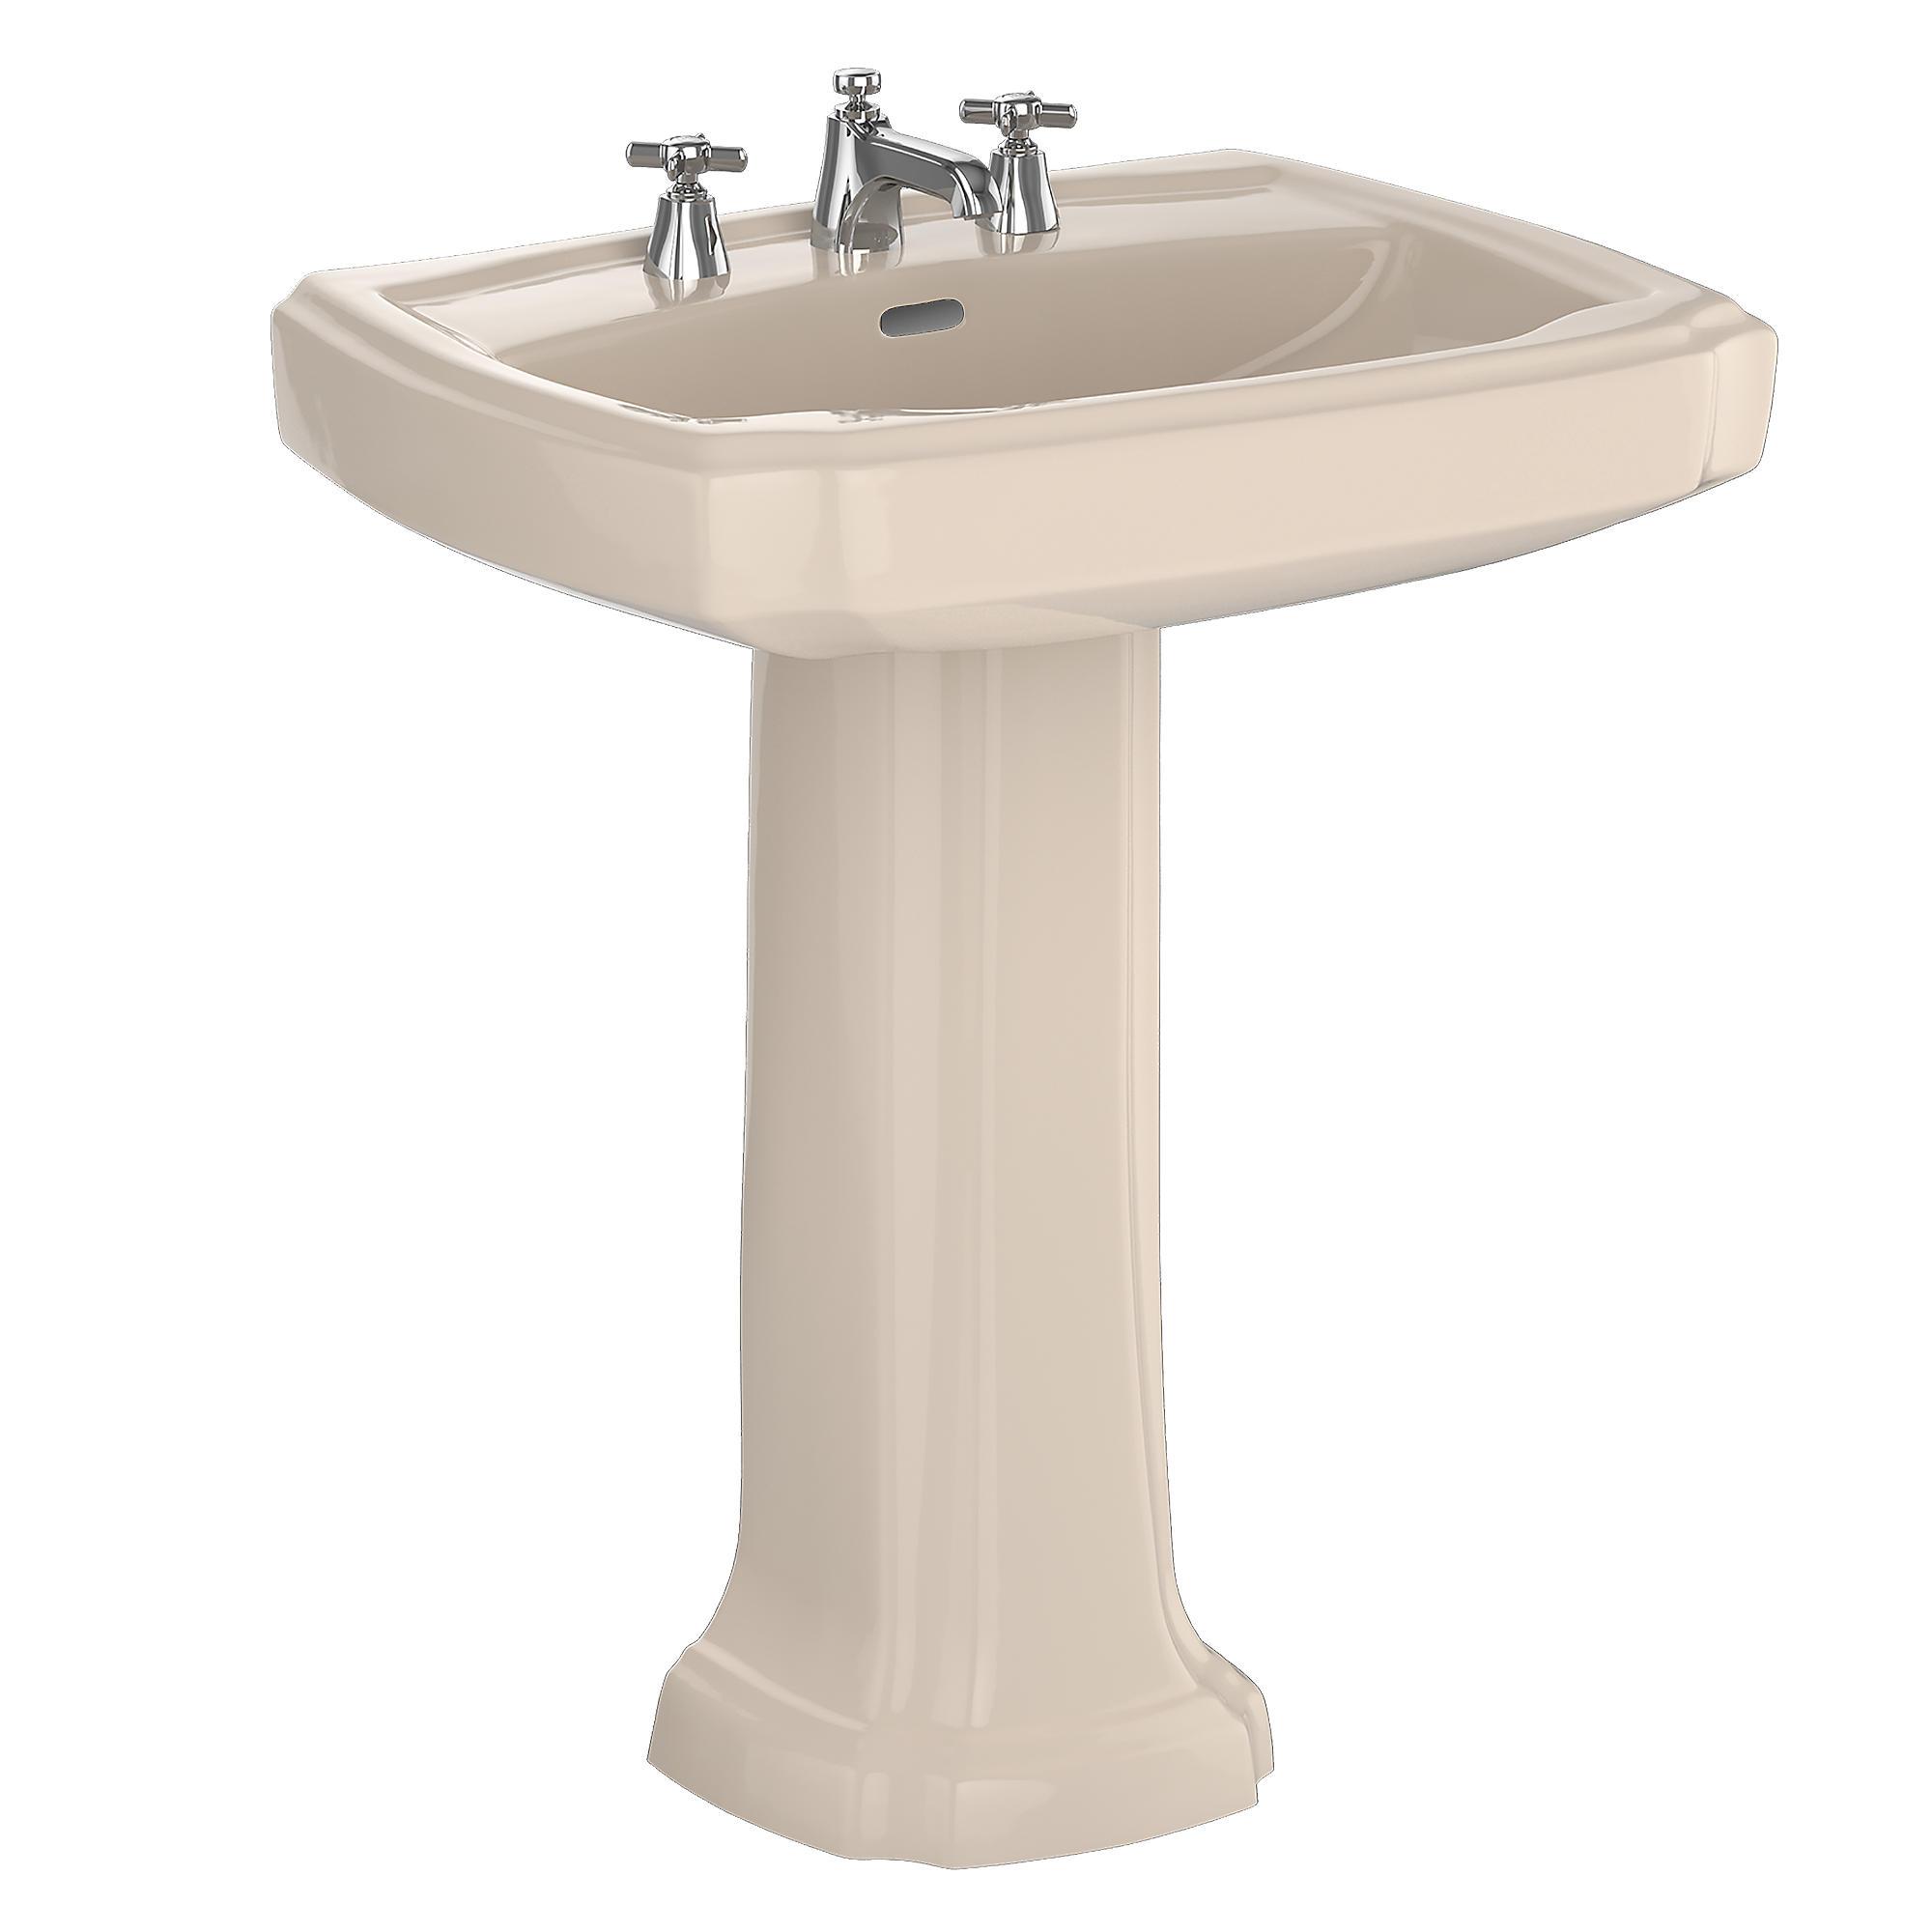 Lpt970 03 guinevere  27  pedestal lavatory 0